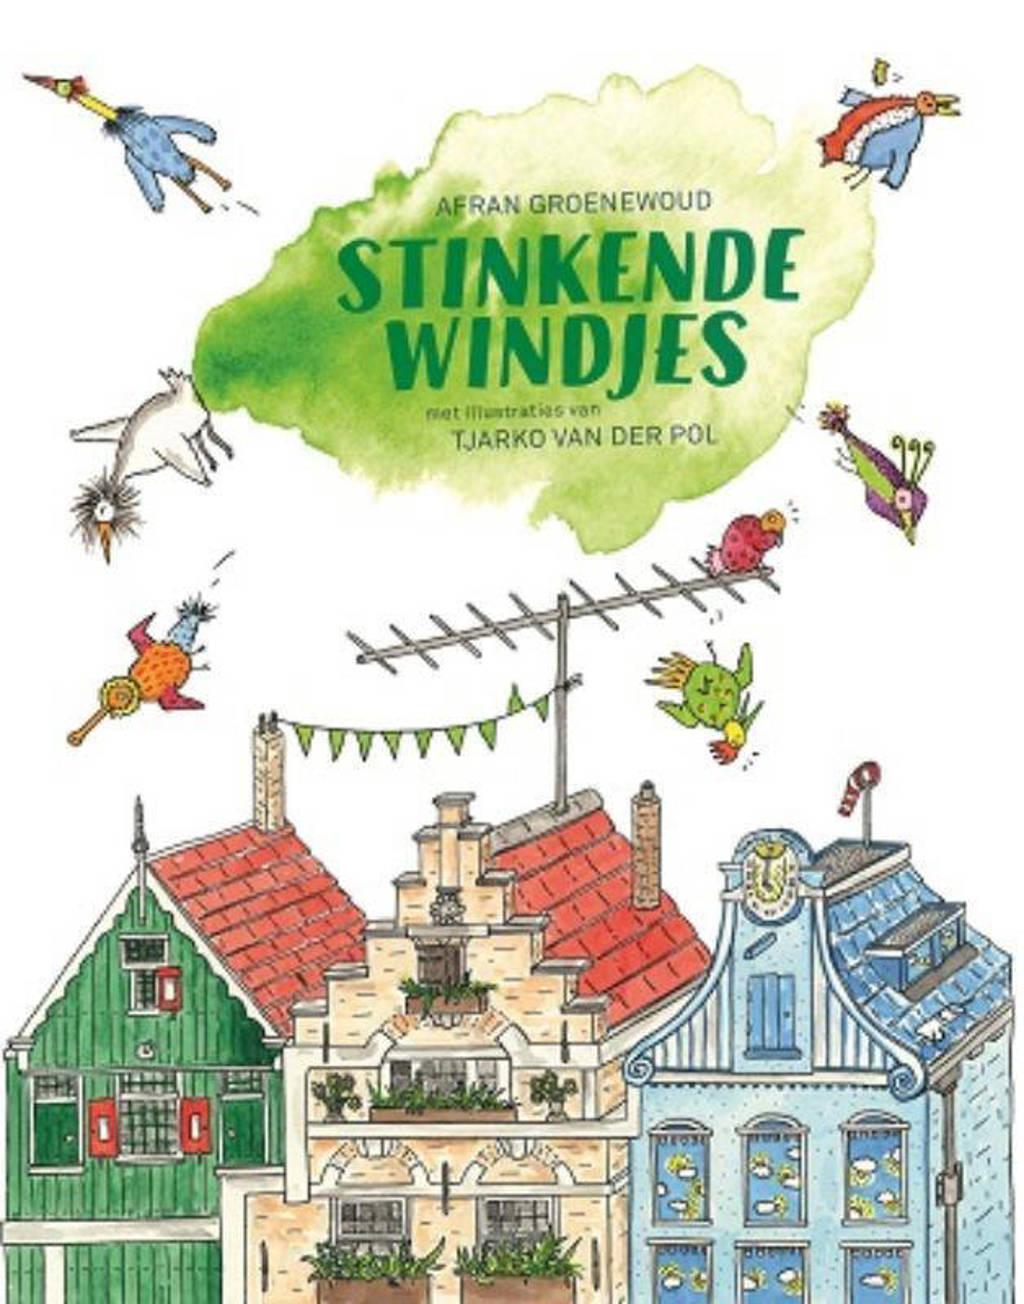 Stinkende windjes - Afran Groenewoud en Tjarko van der Pol